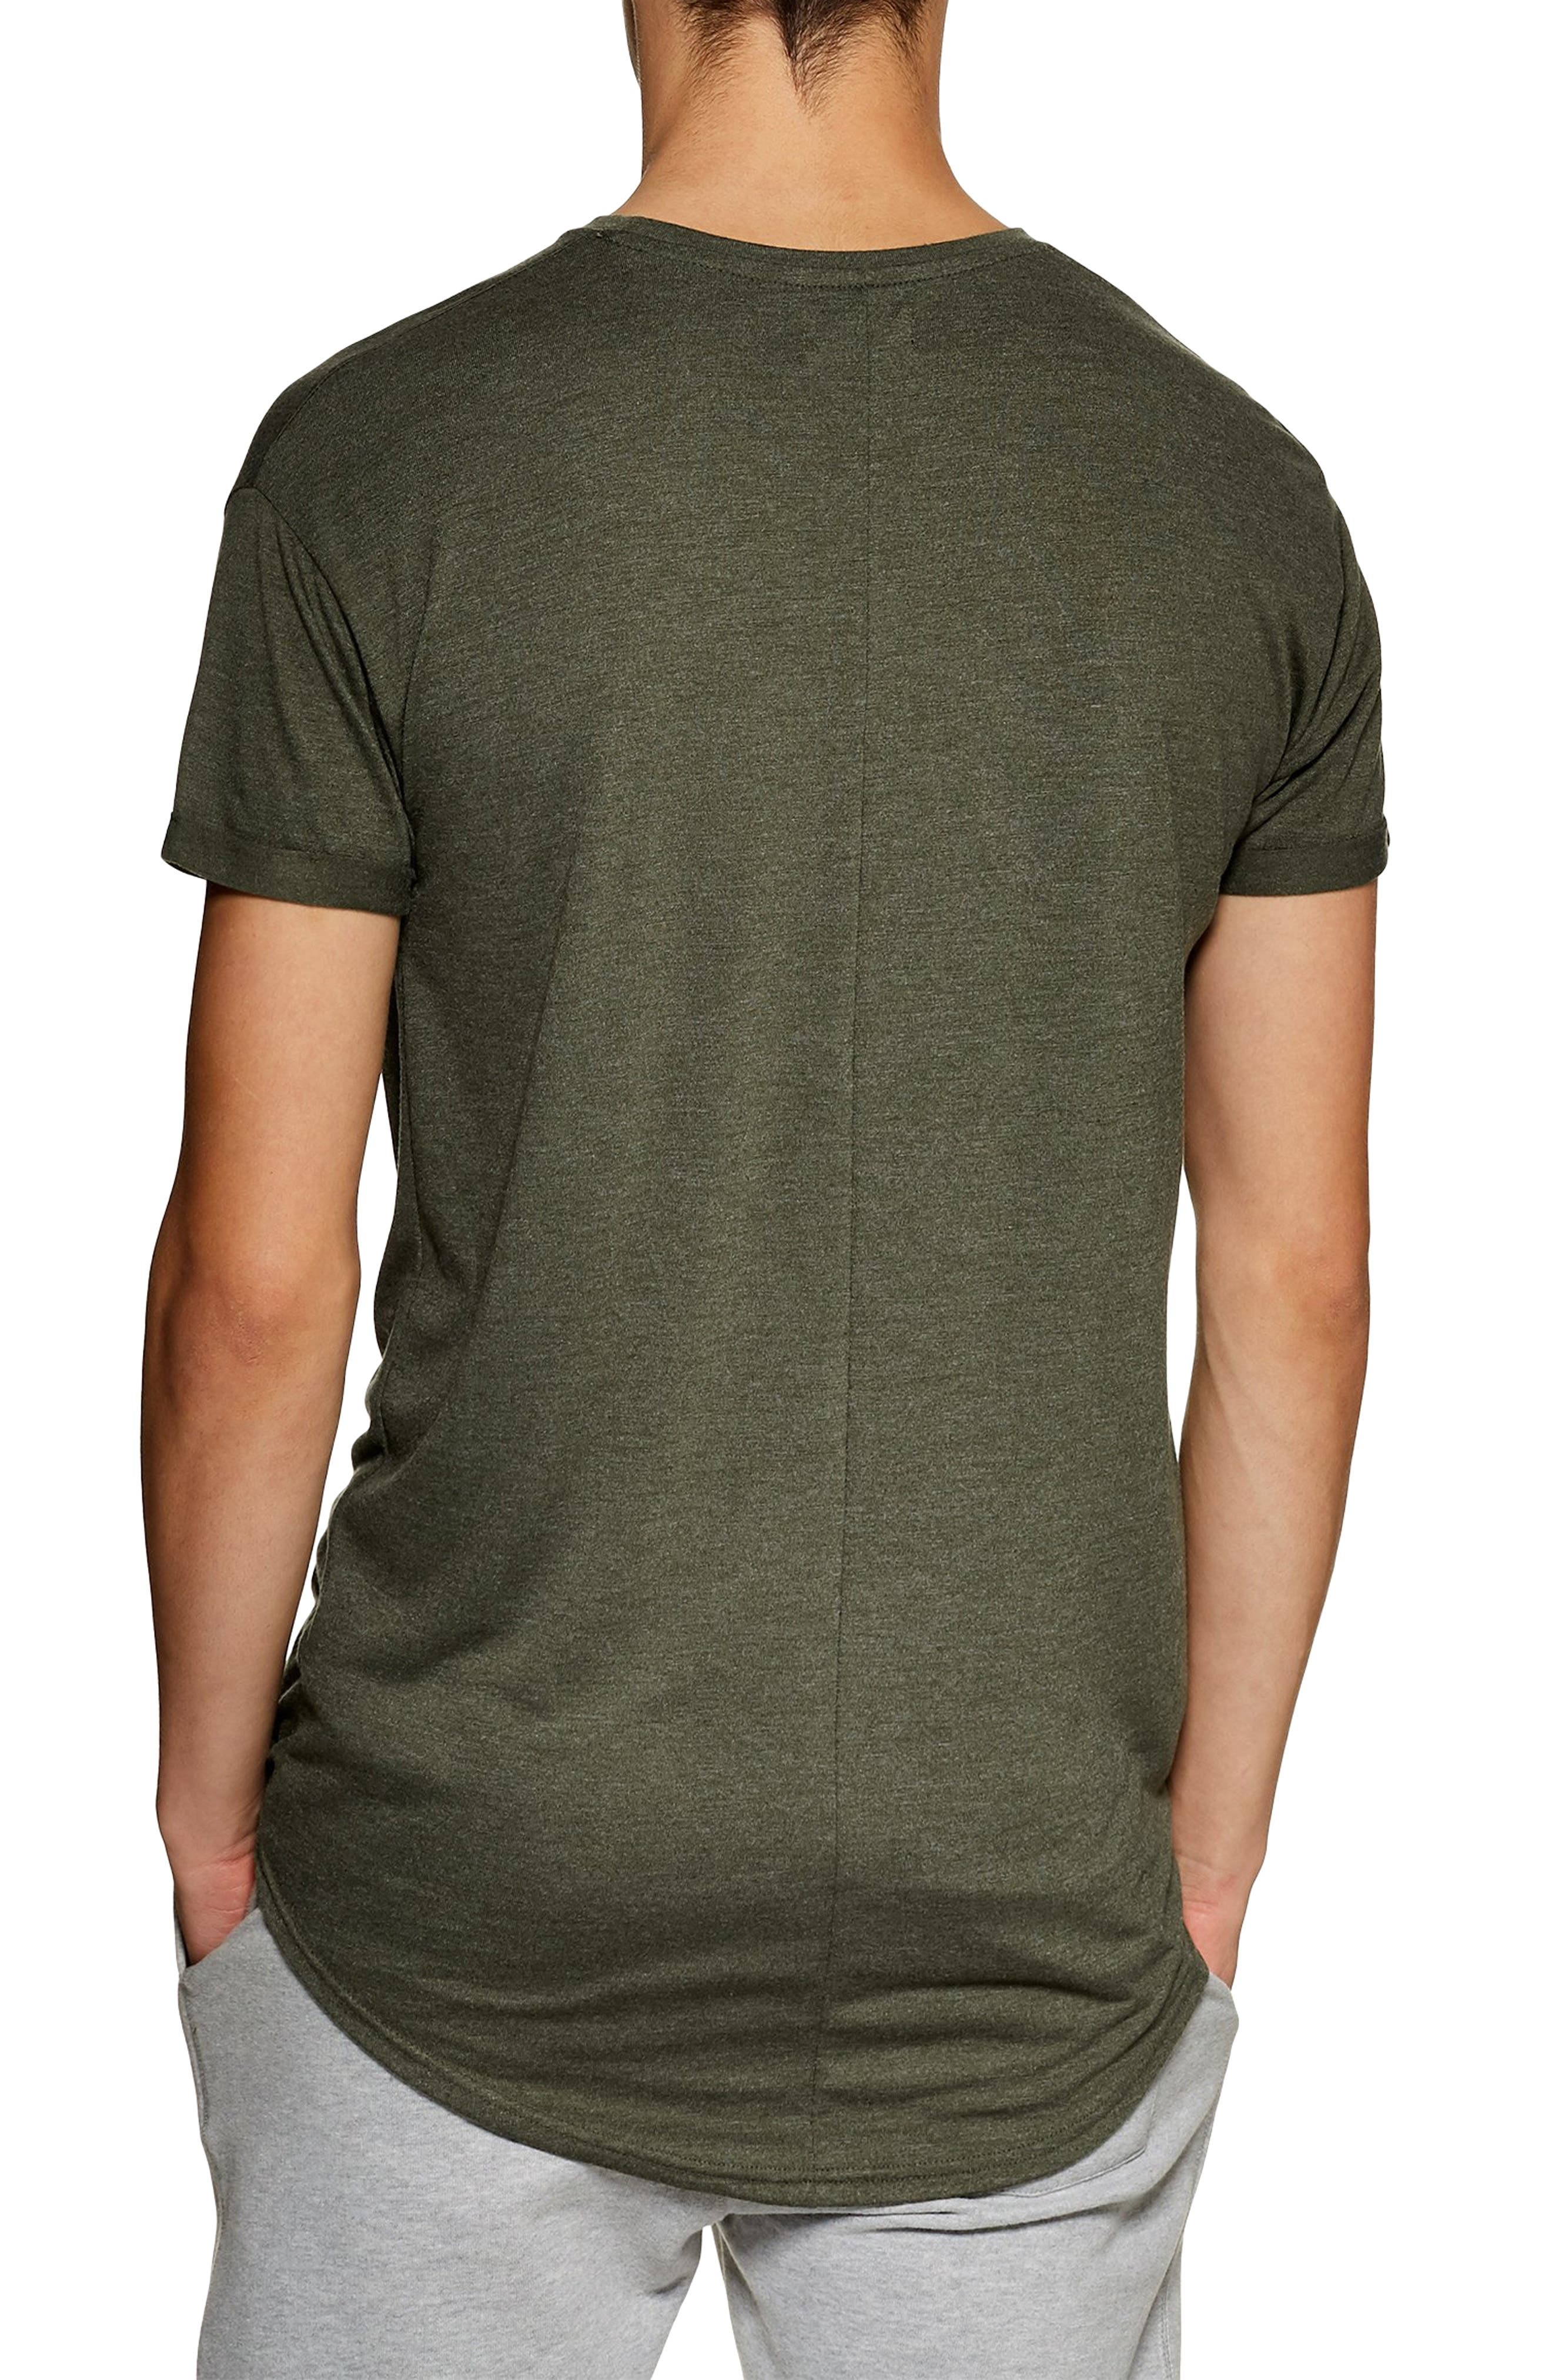 1484655746 Men's Topman T-Shirts, Tank Tops, & Graphic Tees | Nordstrom